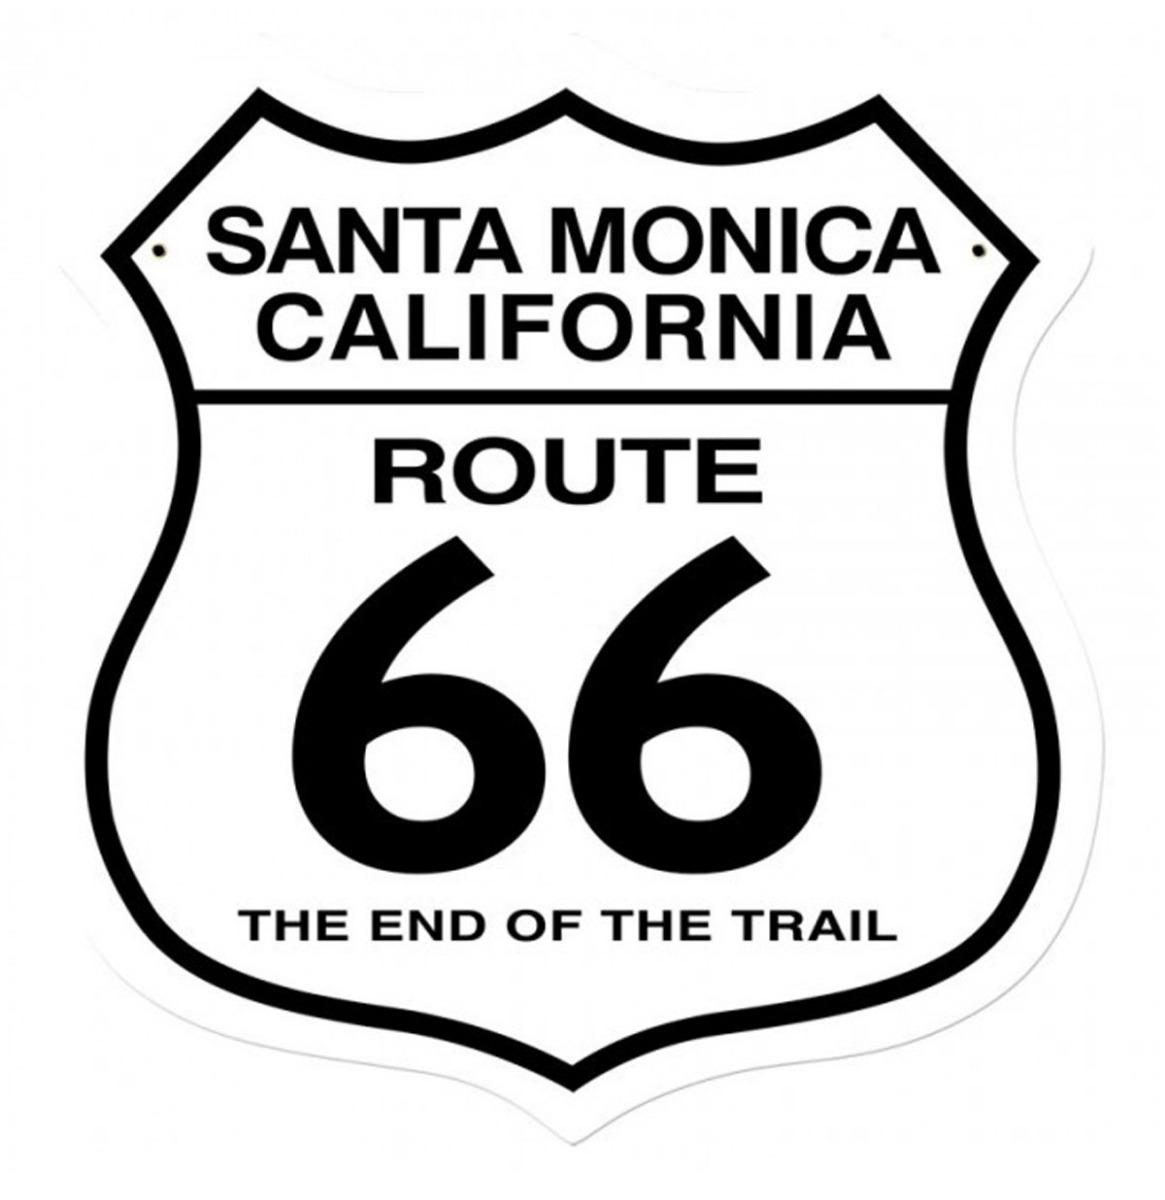 Santa Monica Route 66 The End Of The Trail Zwaar Metalen Bord 41 x 38 cm